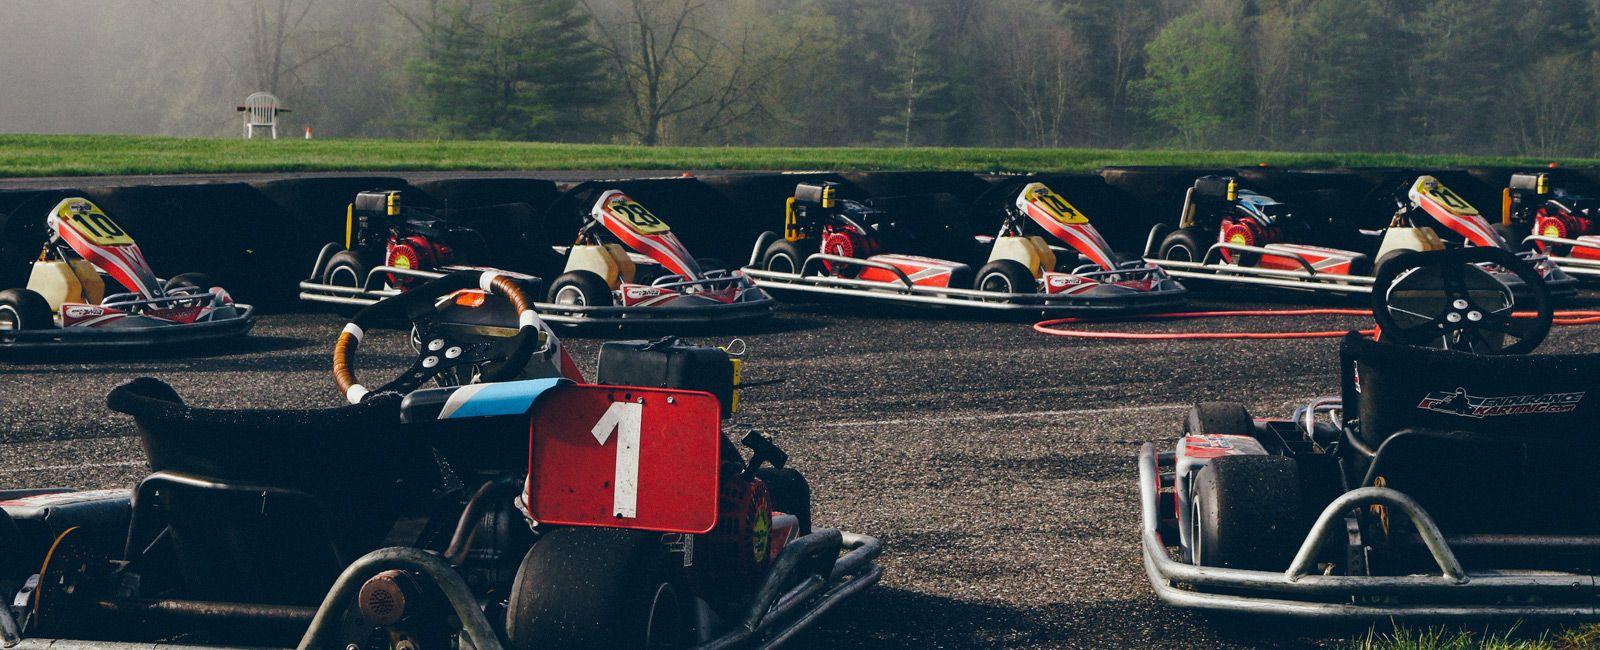 Endurance-Karting-Gear-Patrol-Lead-1600-